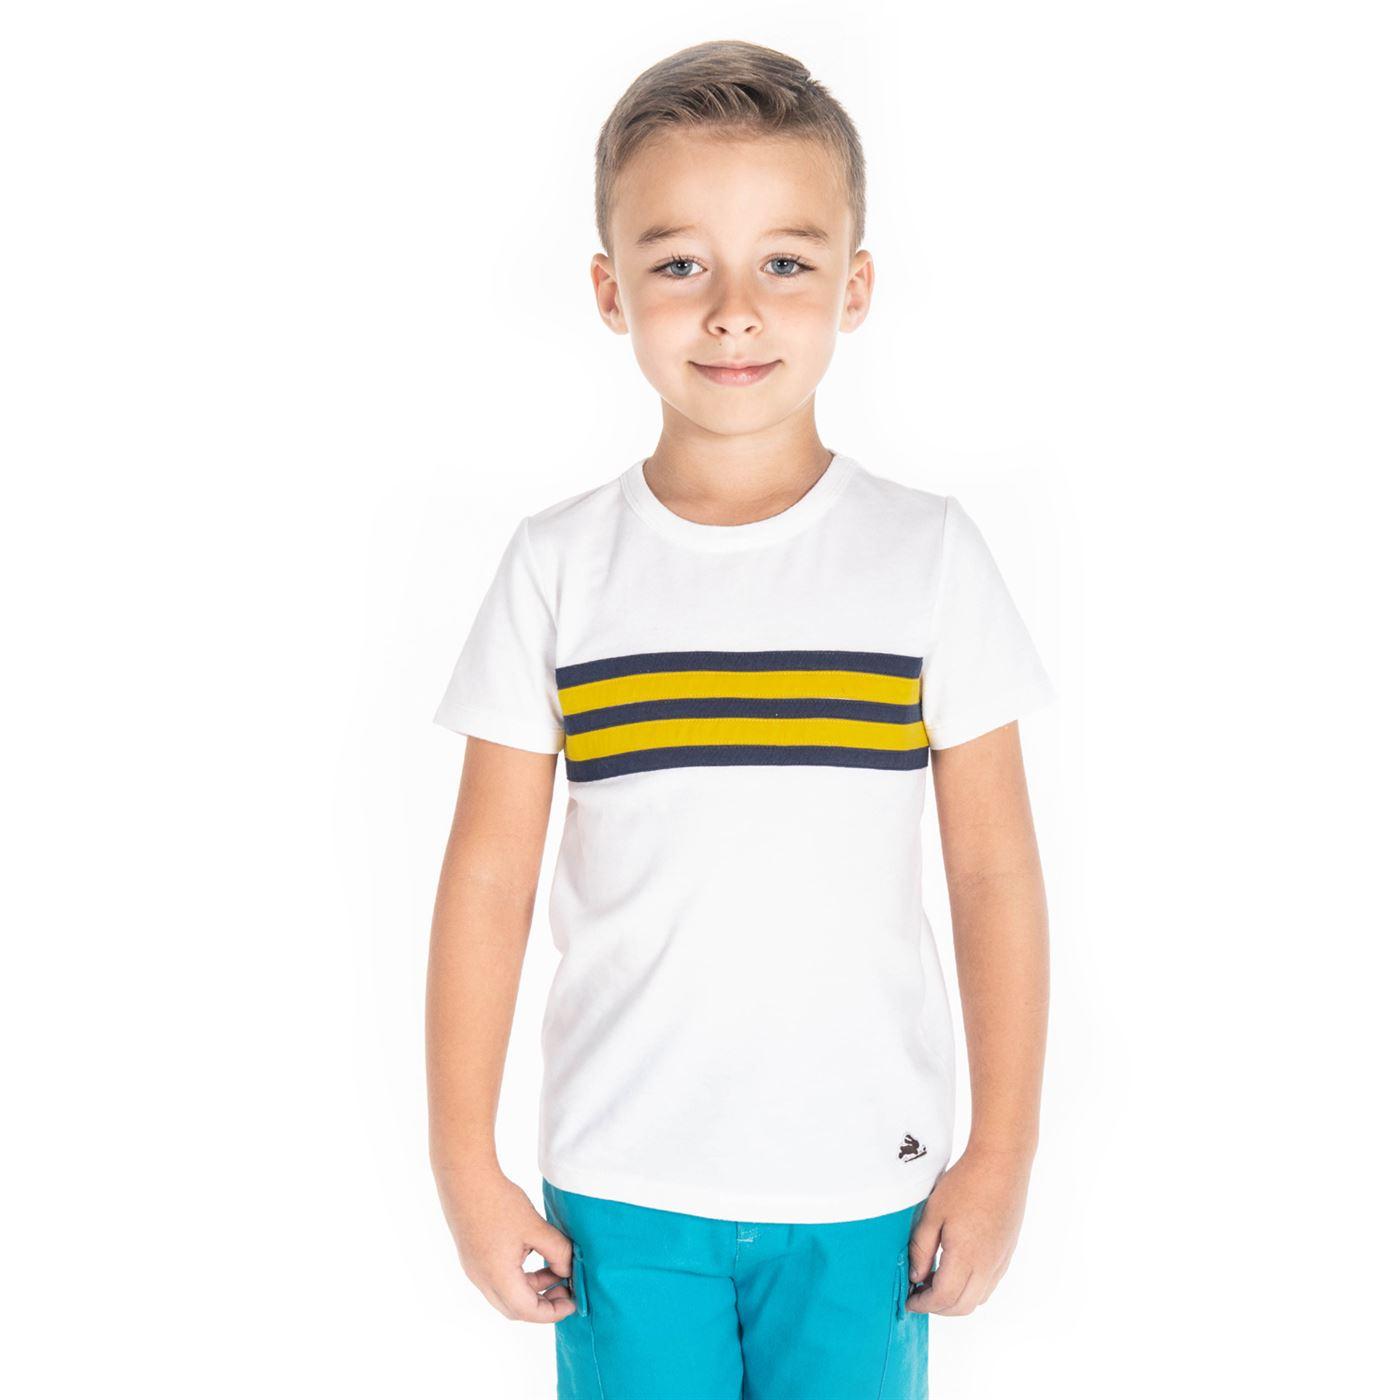 409108ef Cherry Crumble California Boys Casual Wear Striped T-Shirt ...